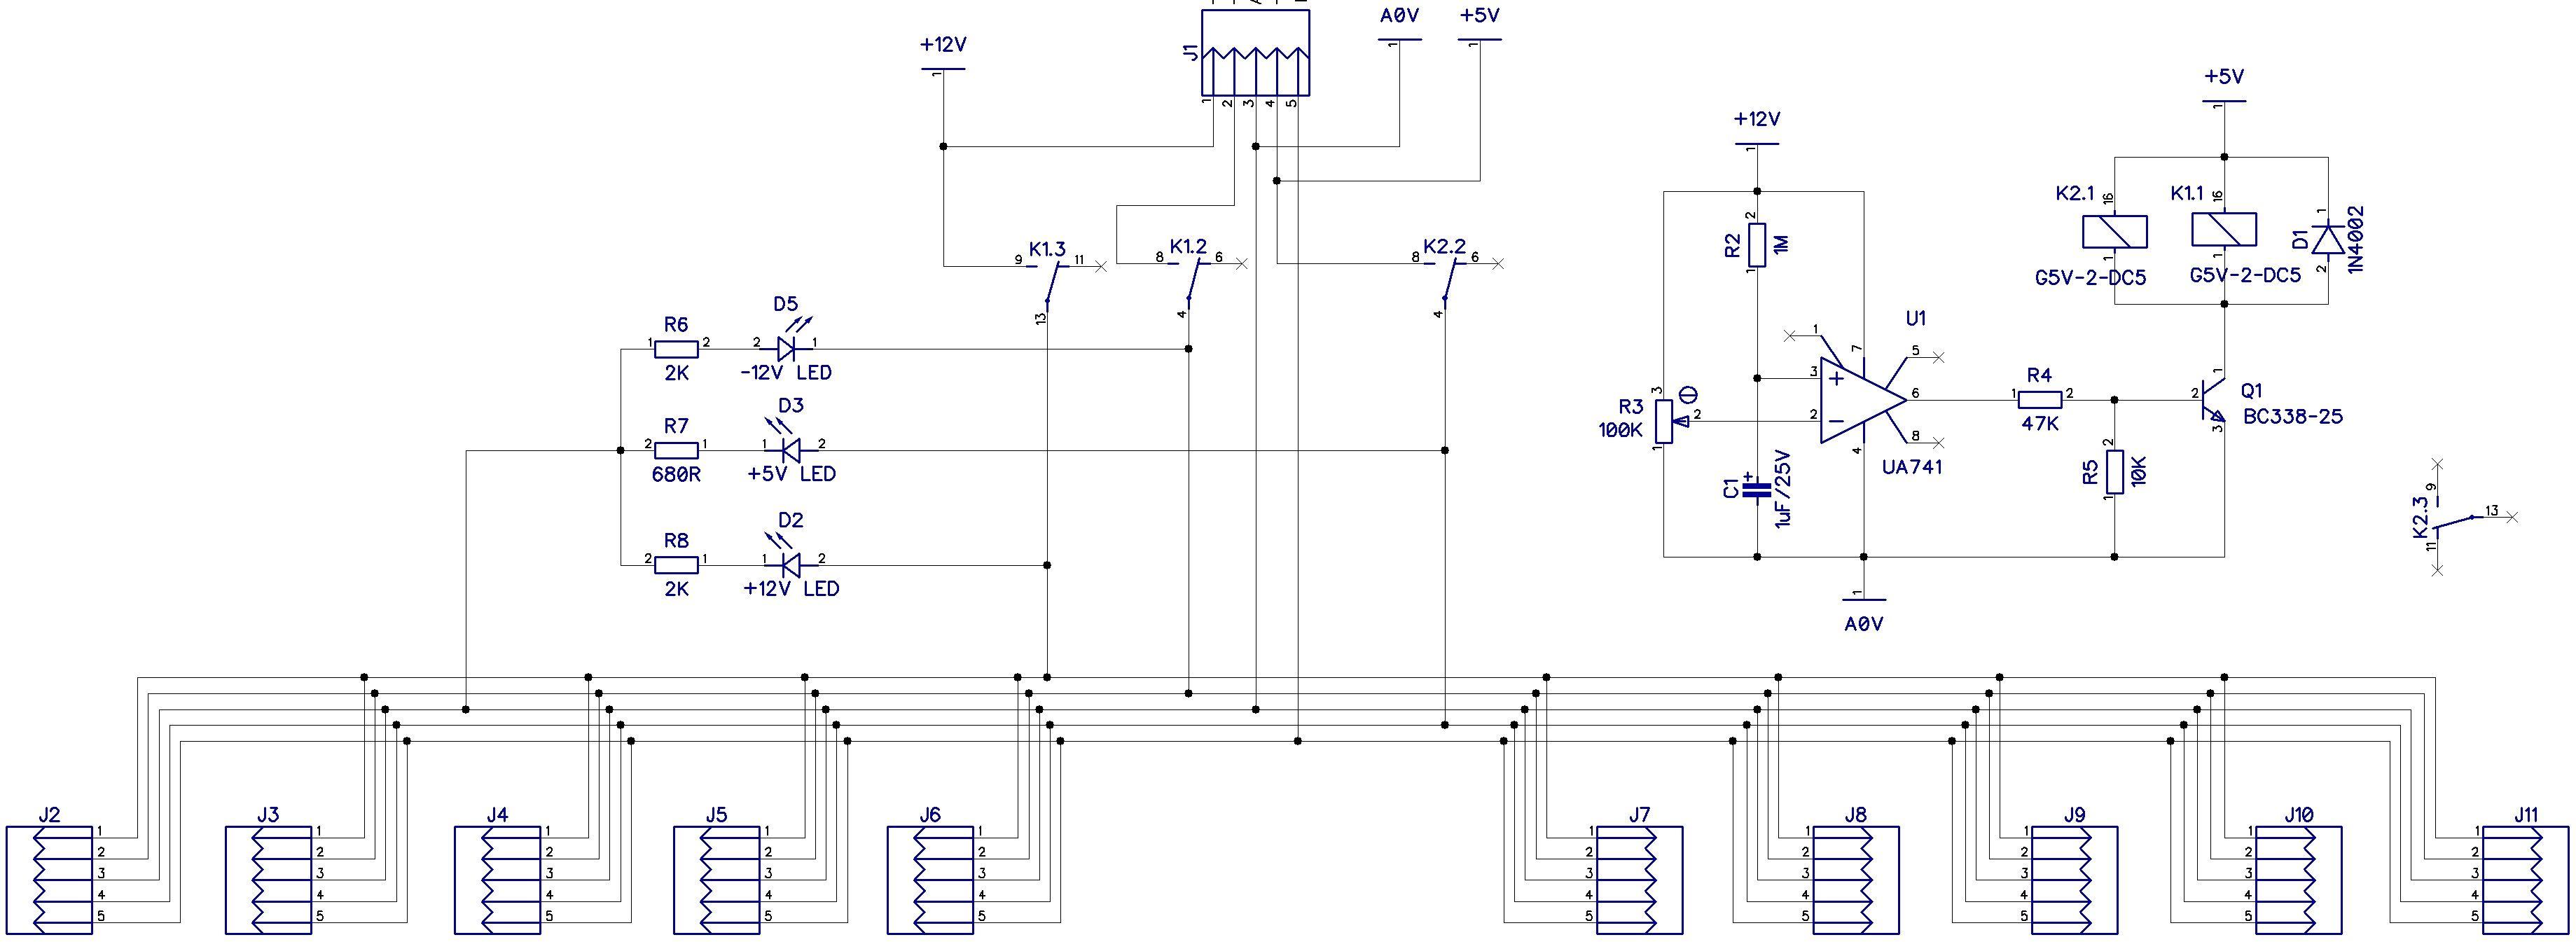 Delayed Power Distribution Board Schematics All About Modular Sk1 Getlofi Circuit Bending Synth Diy